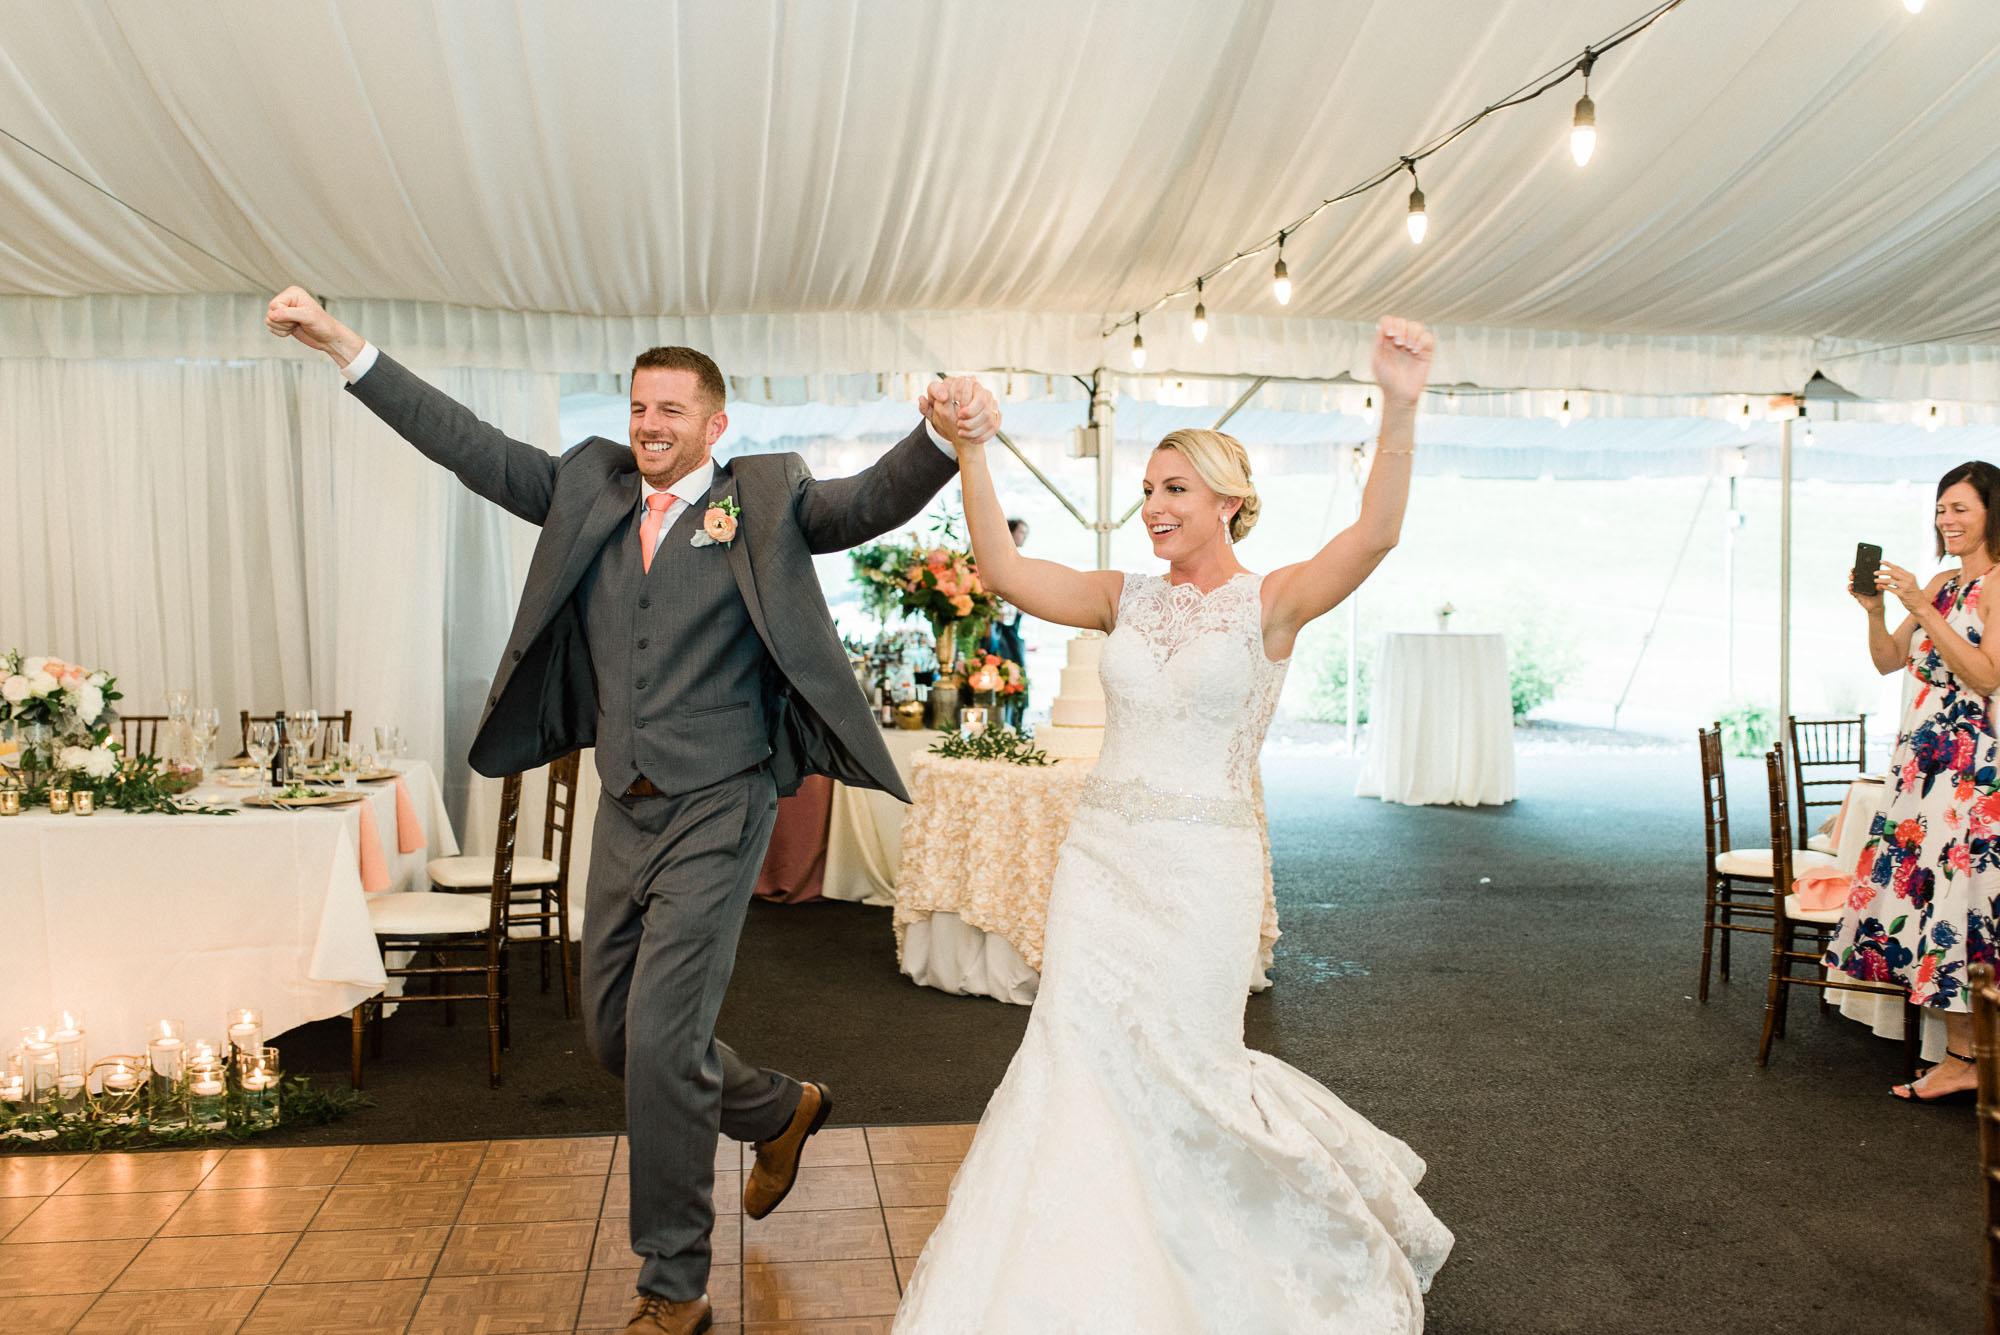 Allenberry-resort-historic-pennsylvania-wedding-1679.jpg